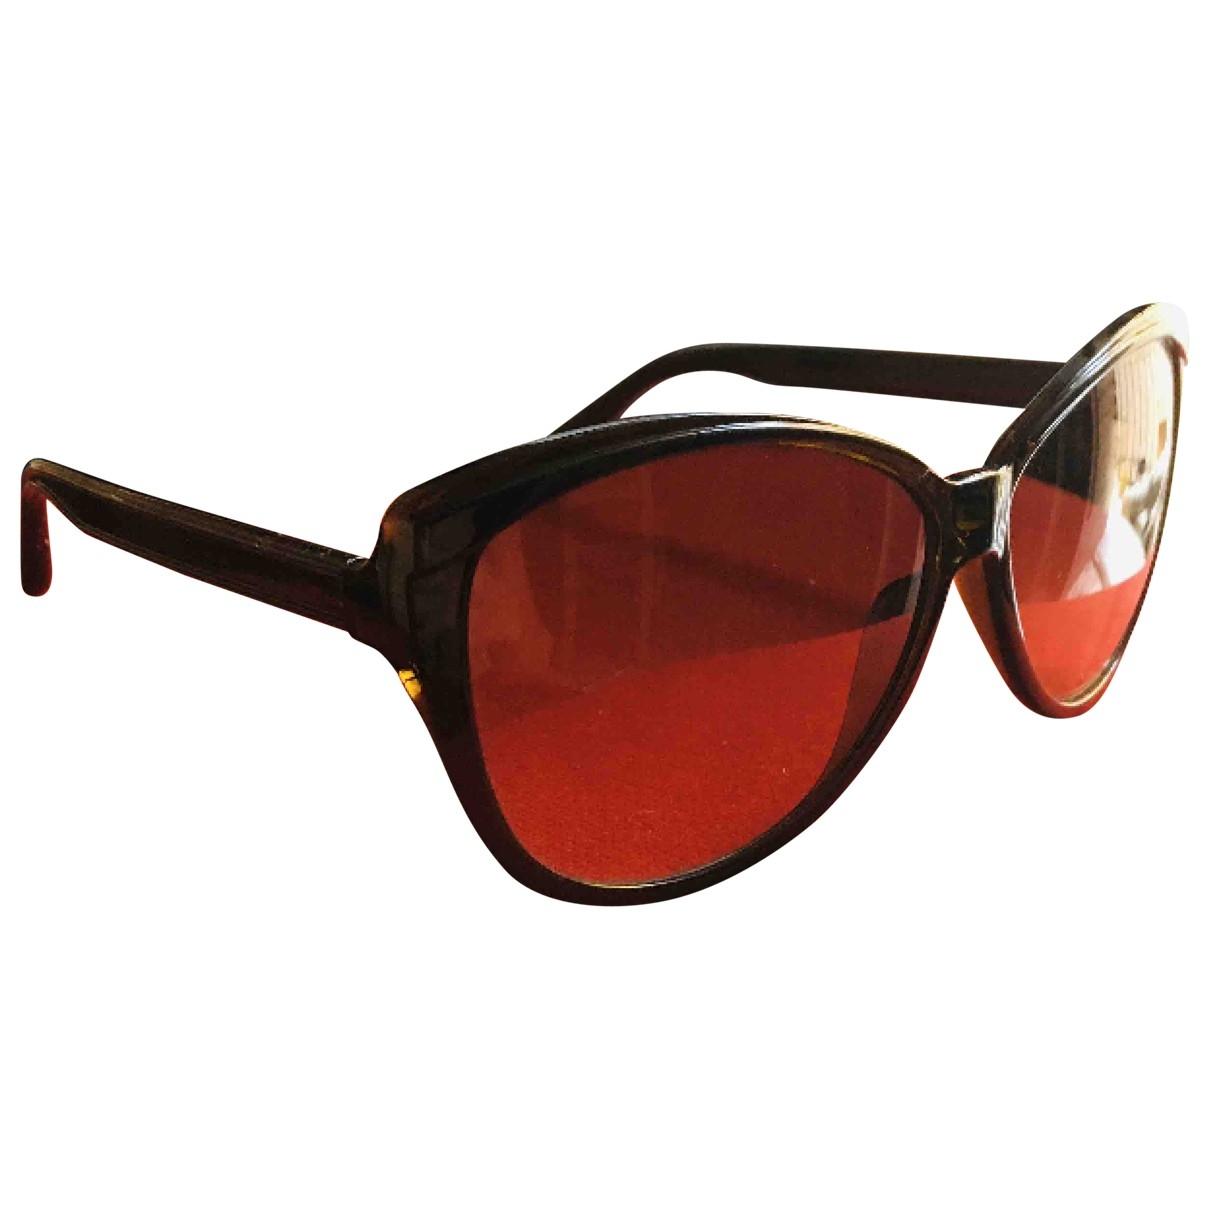 Marc By Marc Jacobs \N Khaki Sunglasses for Women \N